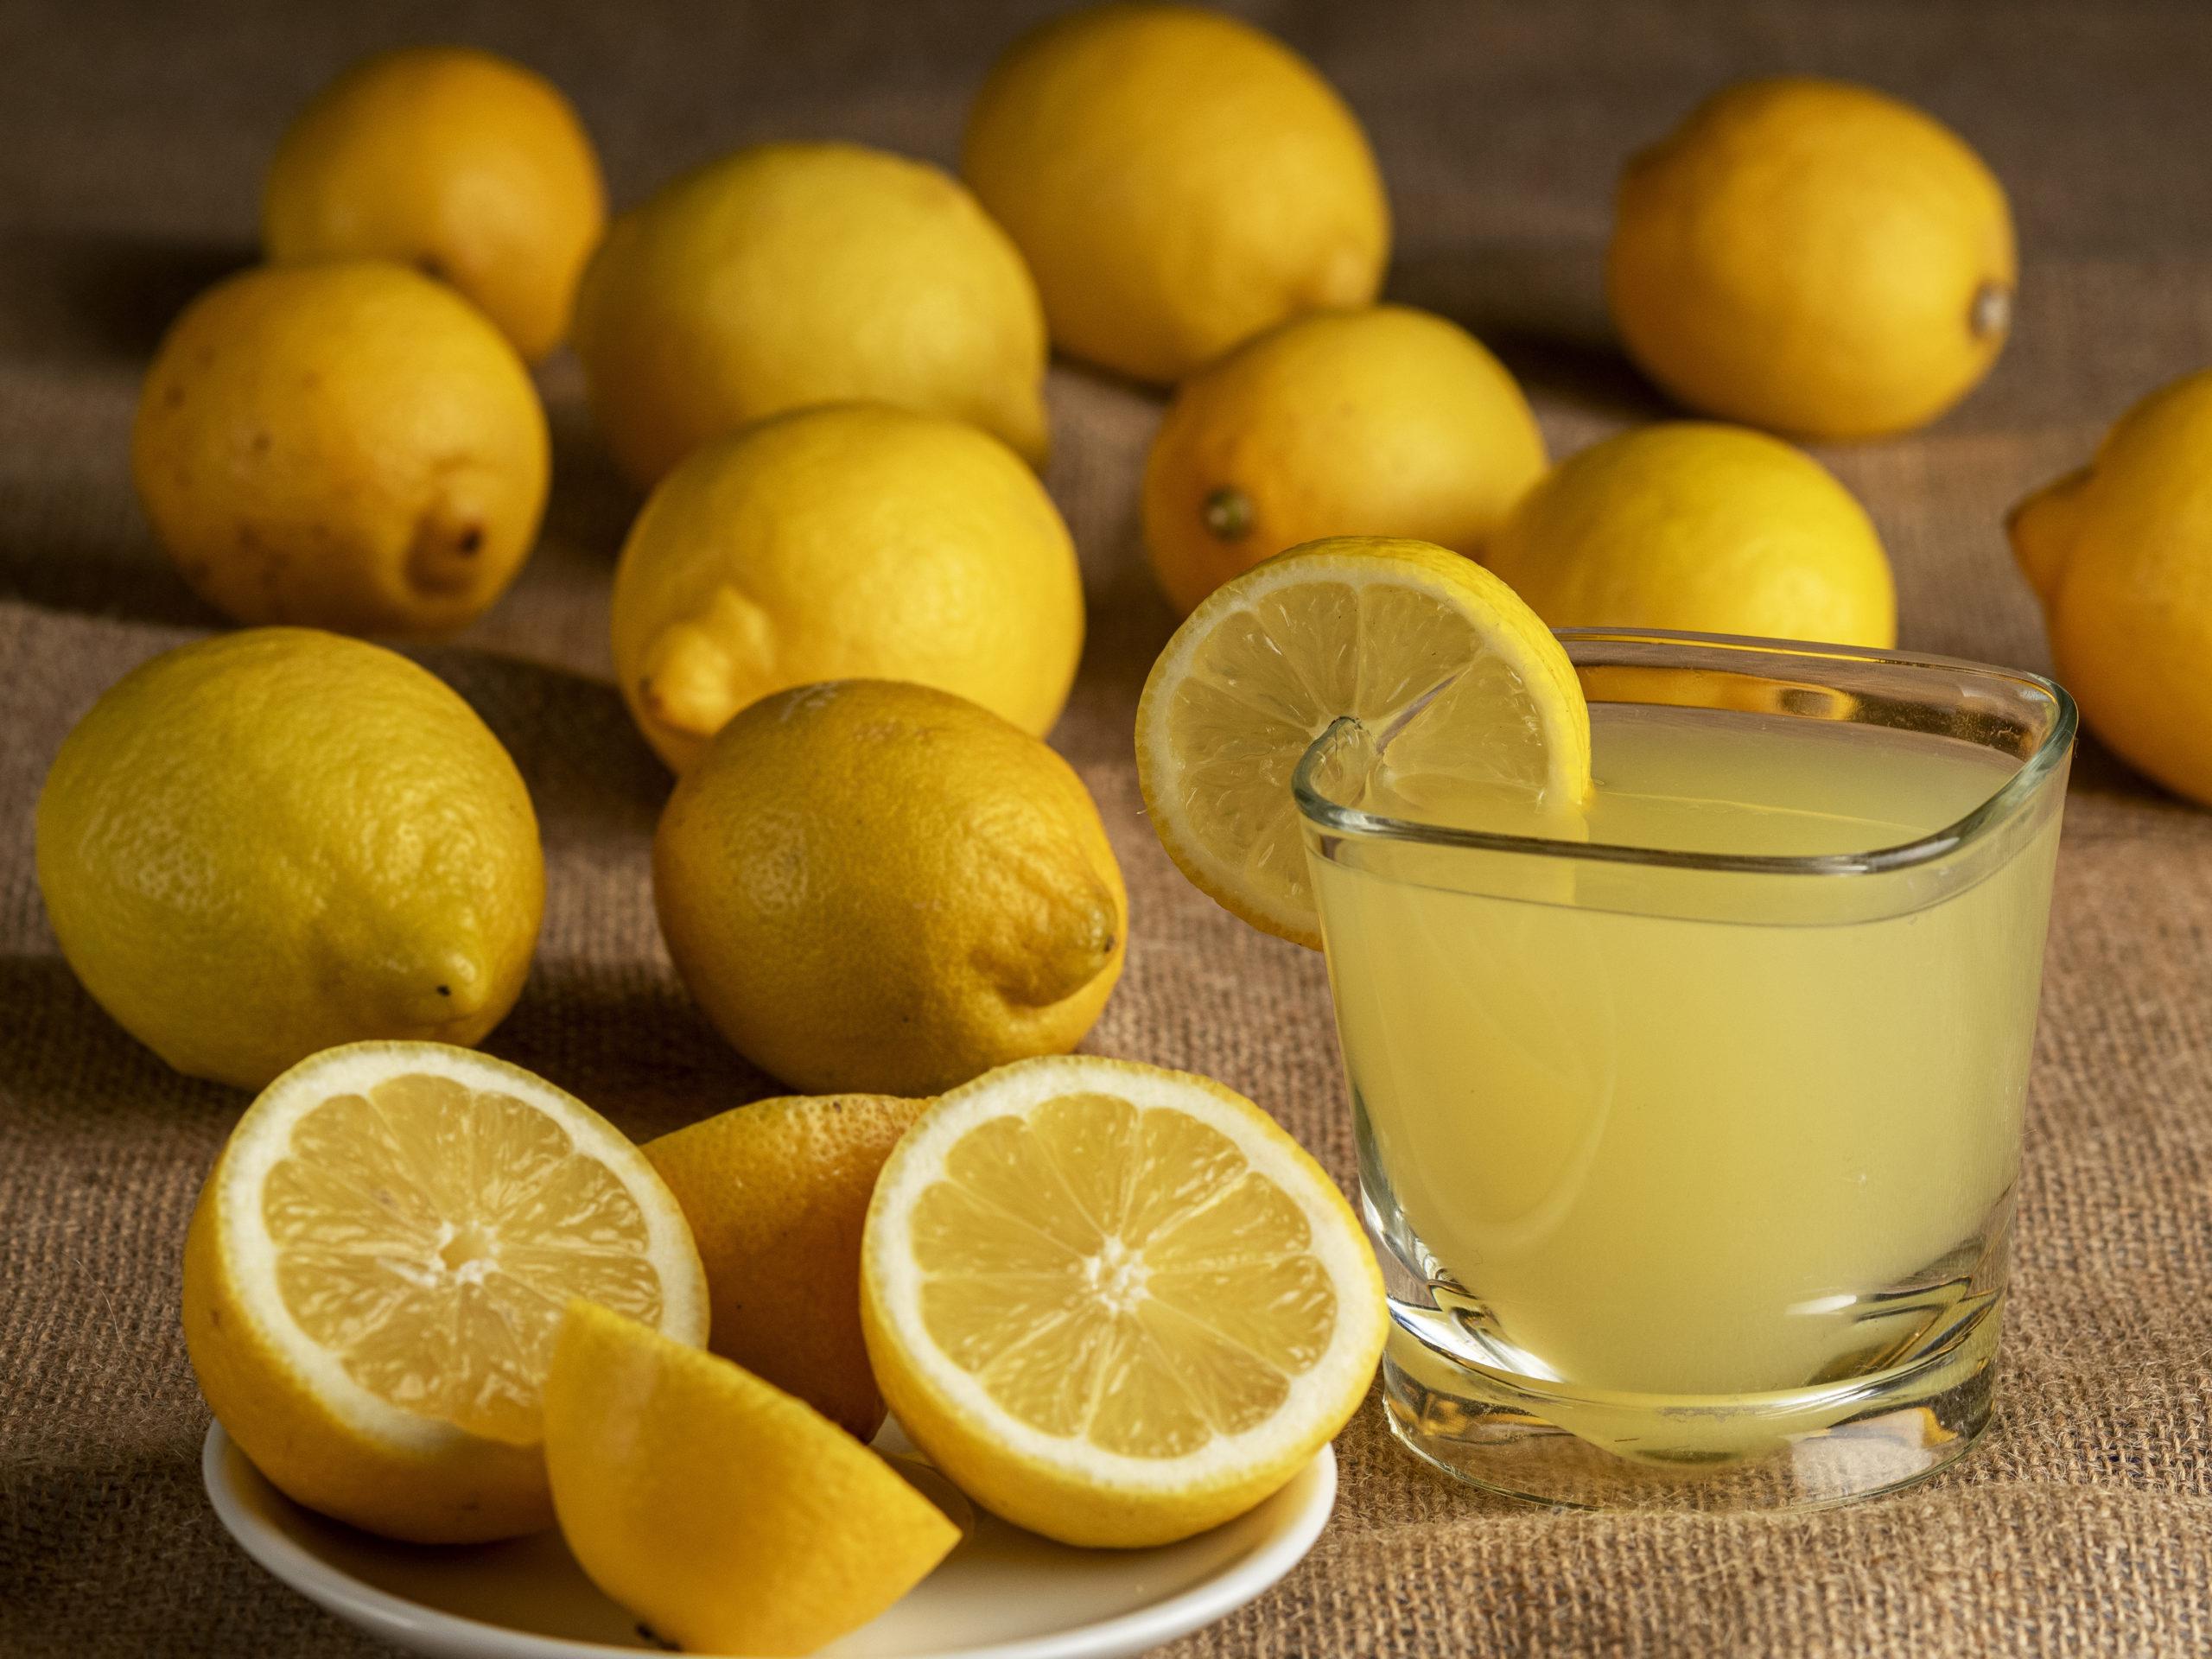 Close-up of a glass of lemonade with lemons